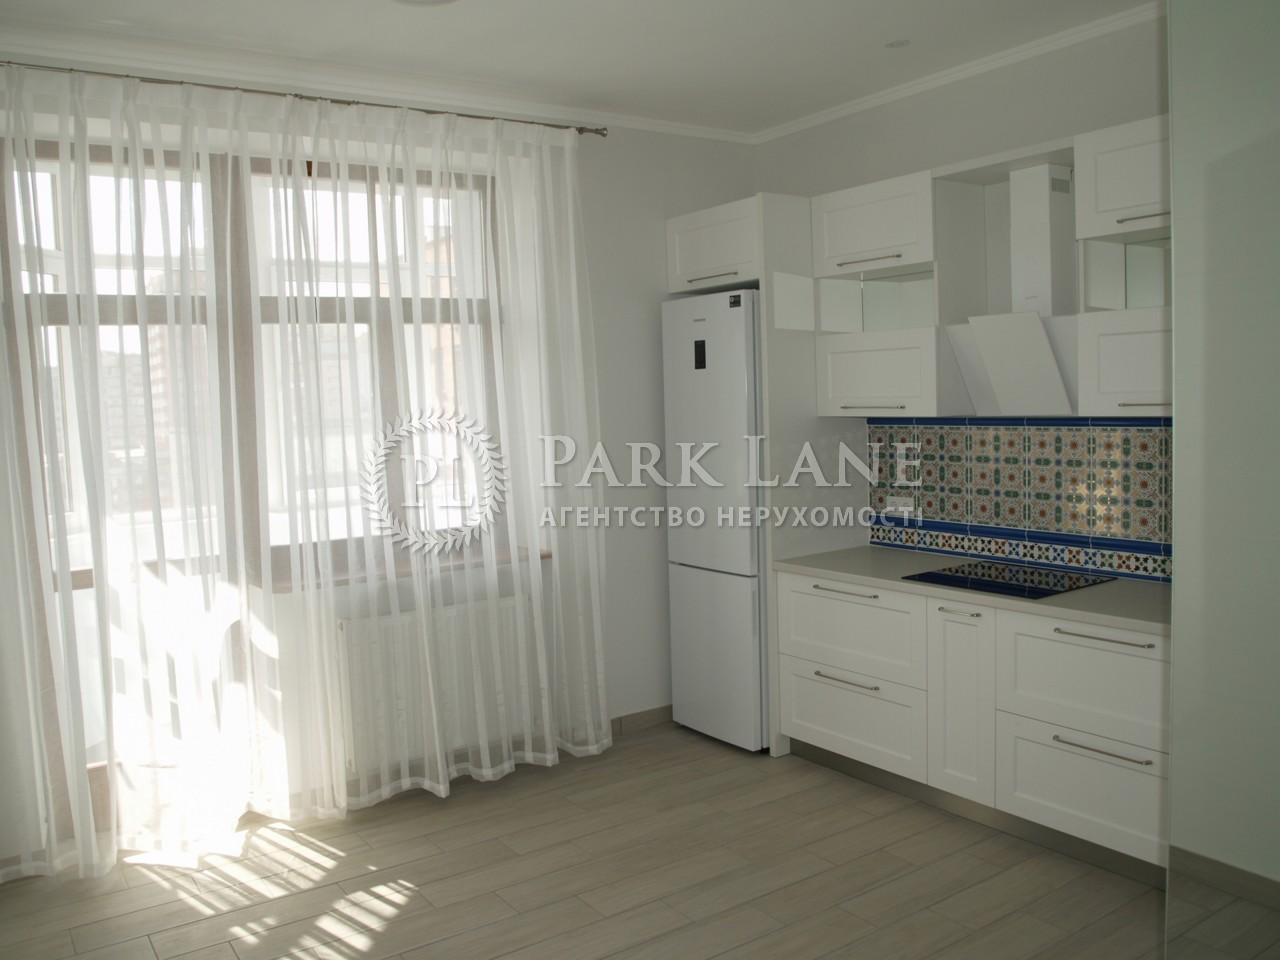 Квартира ул. Павловская, 18, Киев, K-26340 - Фото 6